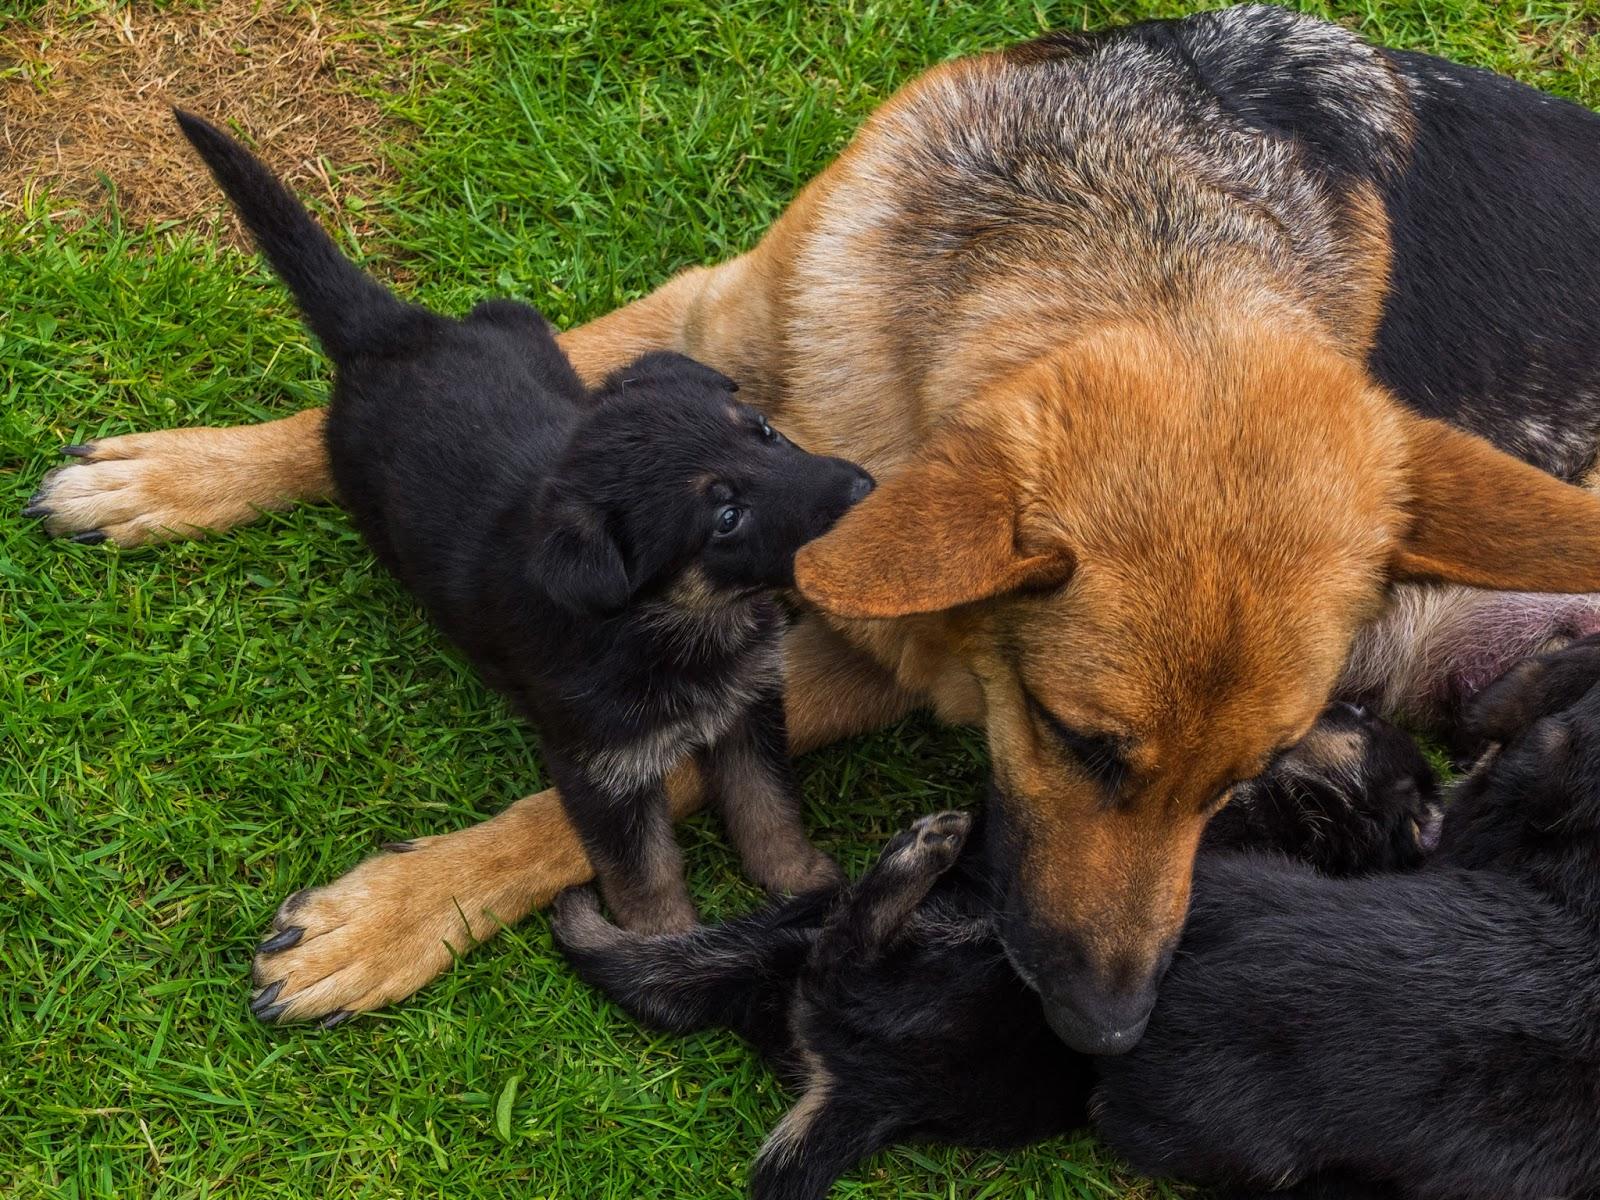 4 week old German Shepherd puppy trying to get her mom's ear.